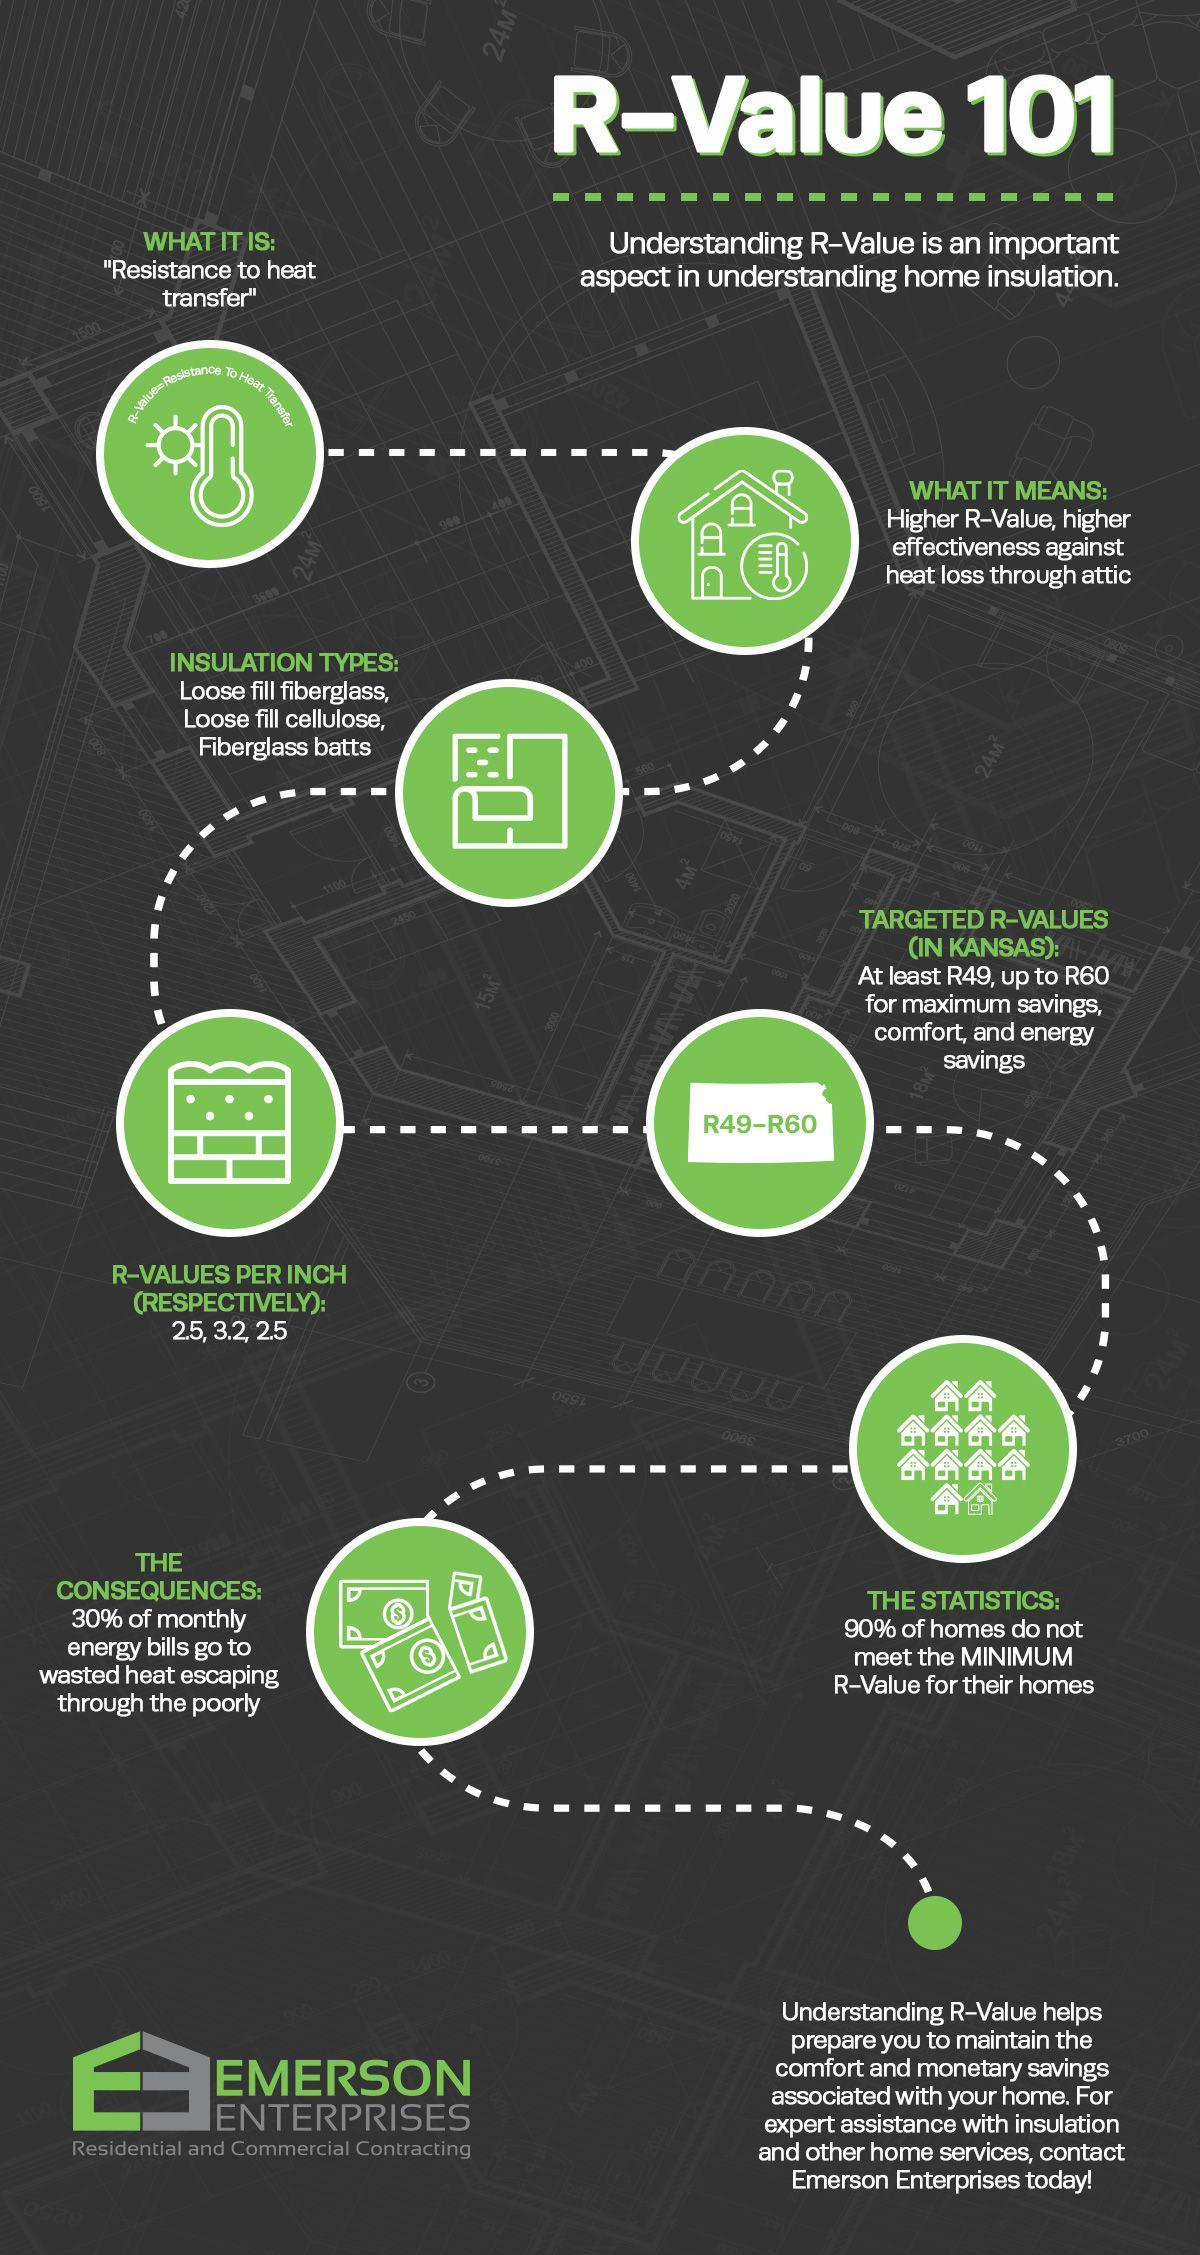 8.31.20_RValue101_Infographic.jpg